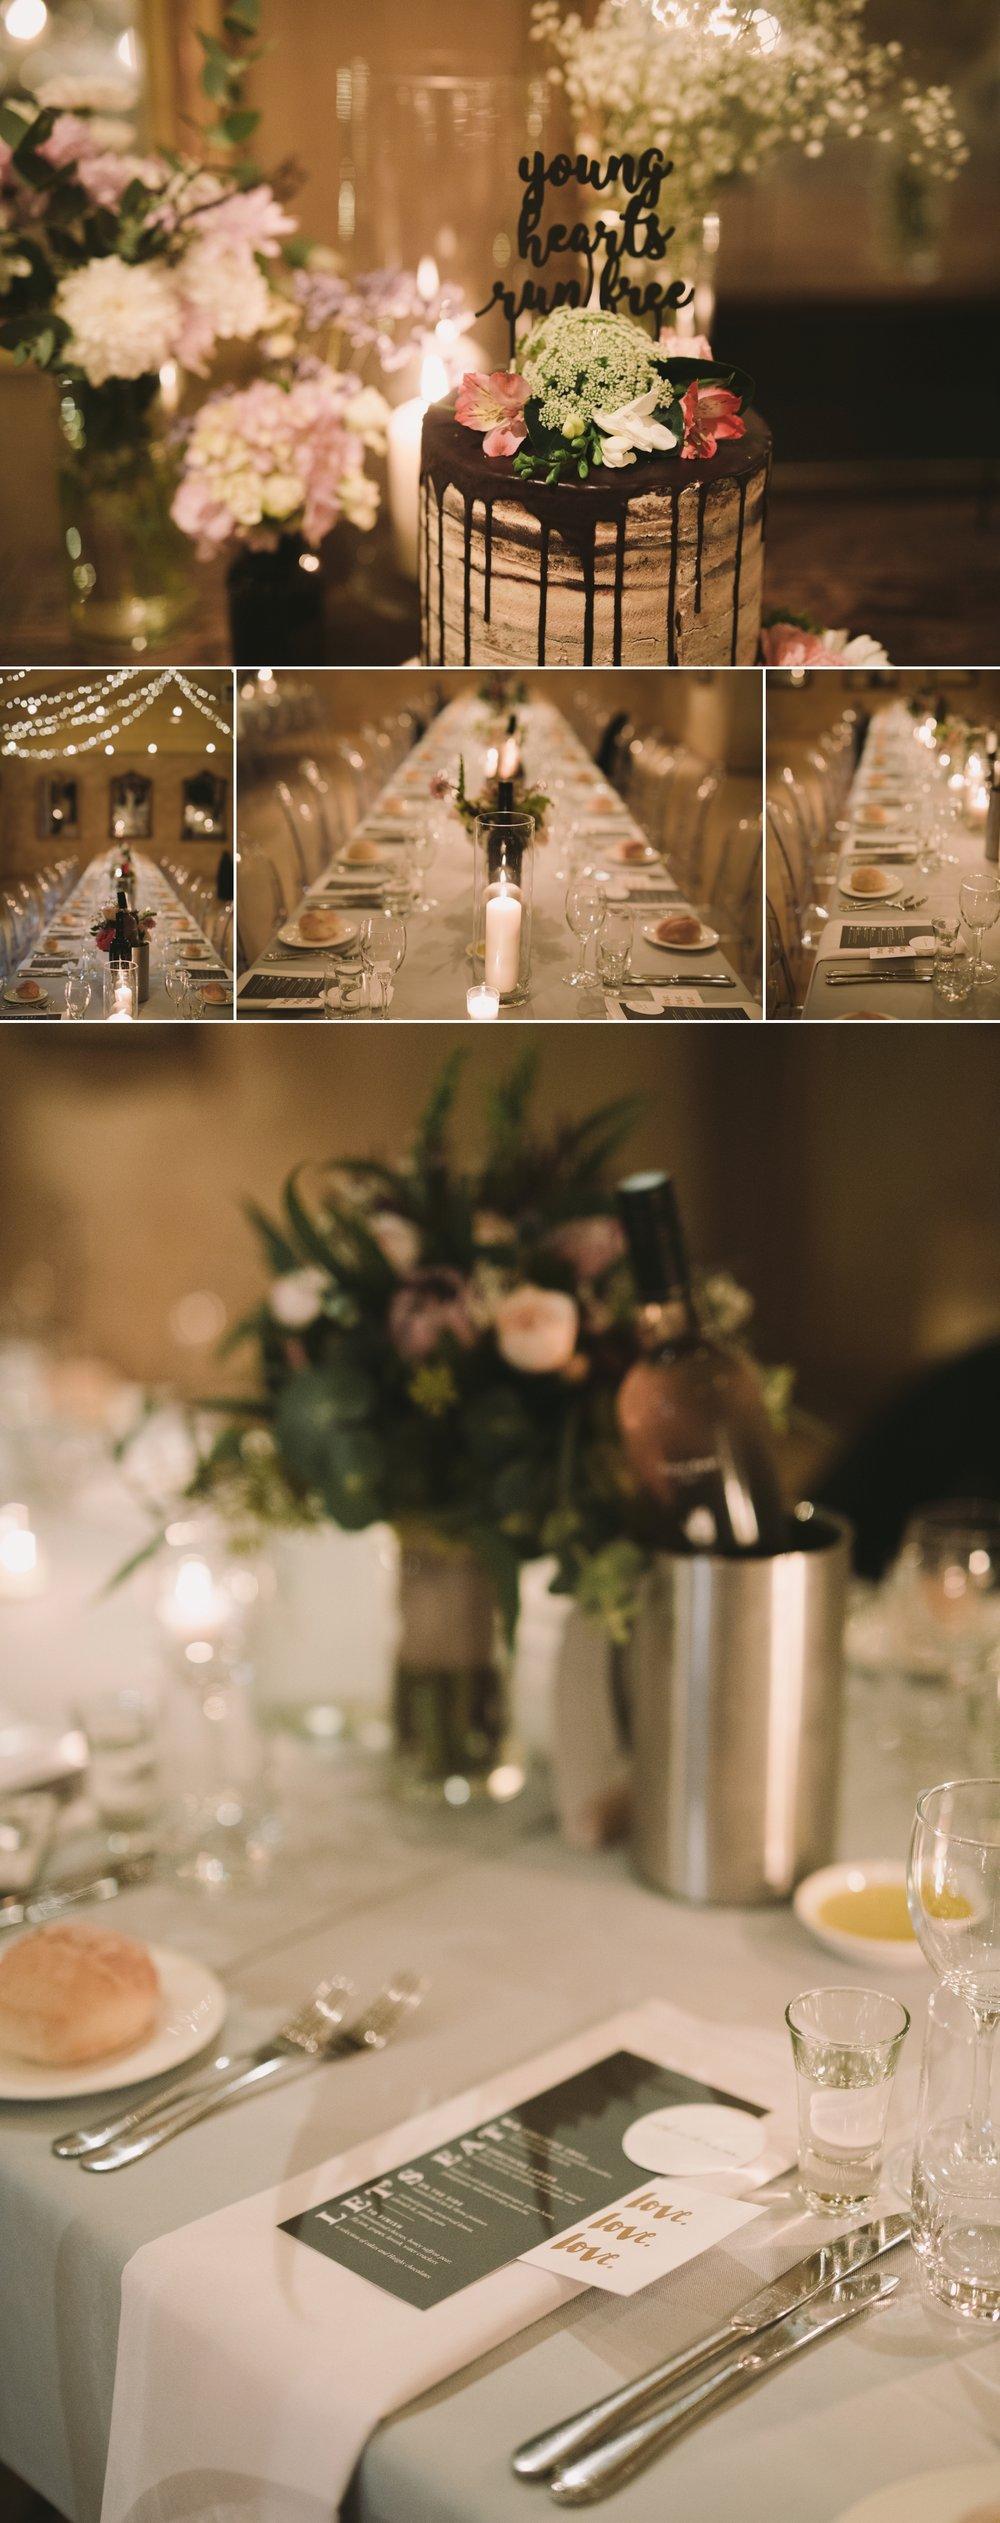 Jo & Aaron - Natural Wedding Photography in Adelaide - Beautiful, modern wedding photographer - Al Ru Farm Wedding Photography - Katherine Schultz_0002.jpg